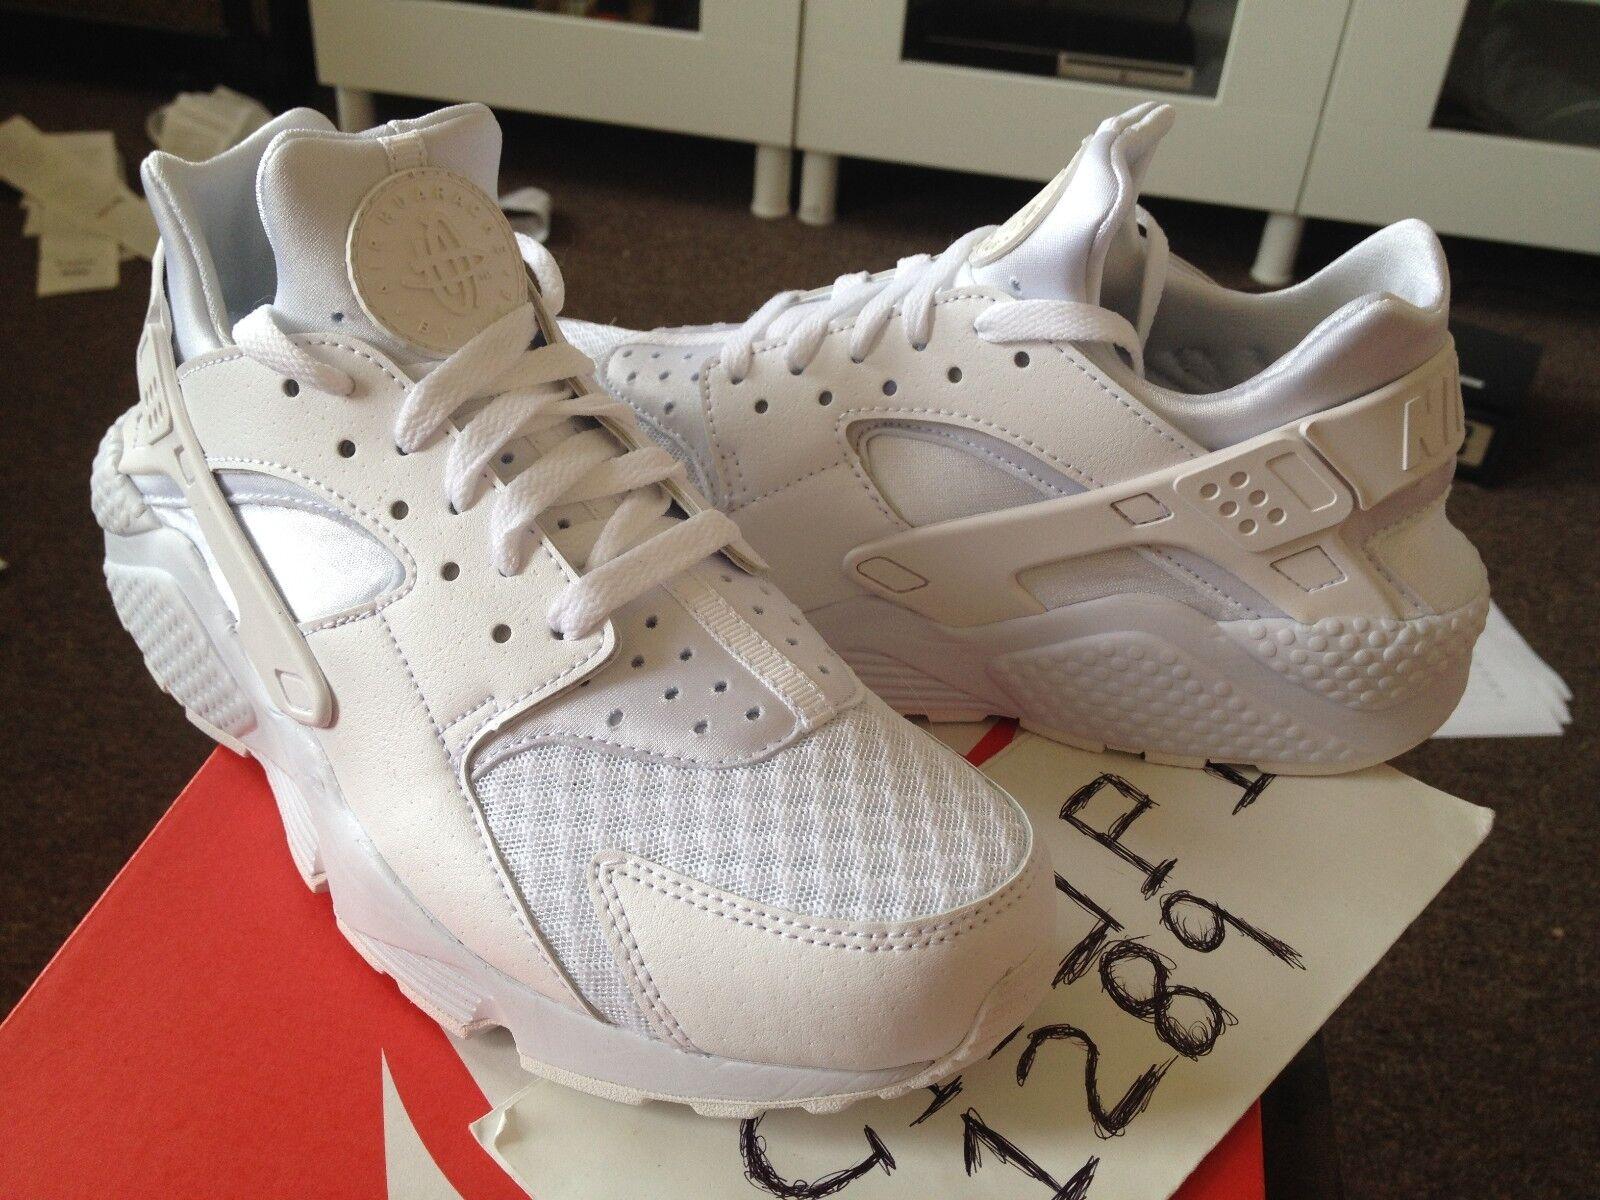 Nike air huarache platino triplo bianco nero puro platino huarache 318429-111 antracite le euro b822db